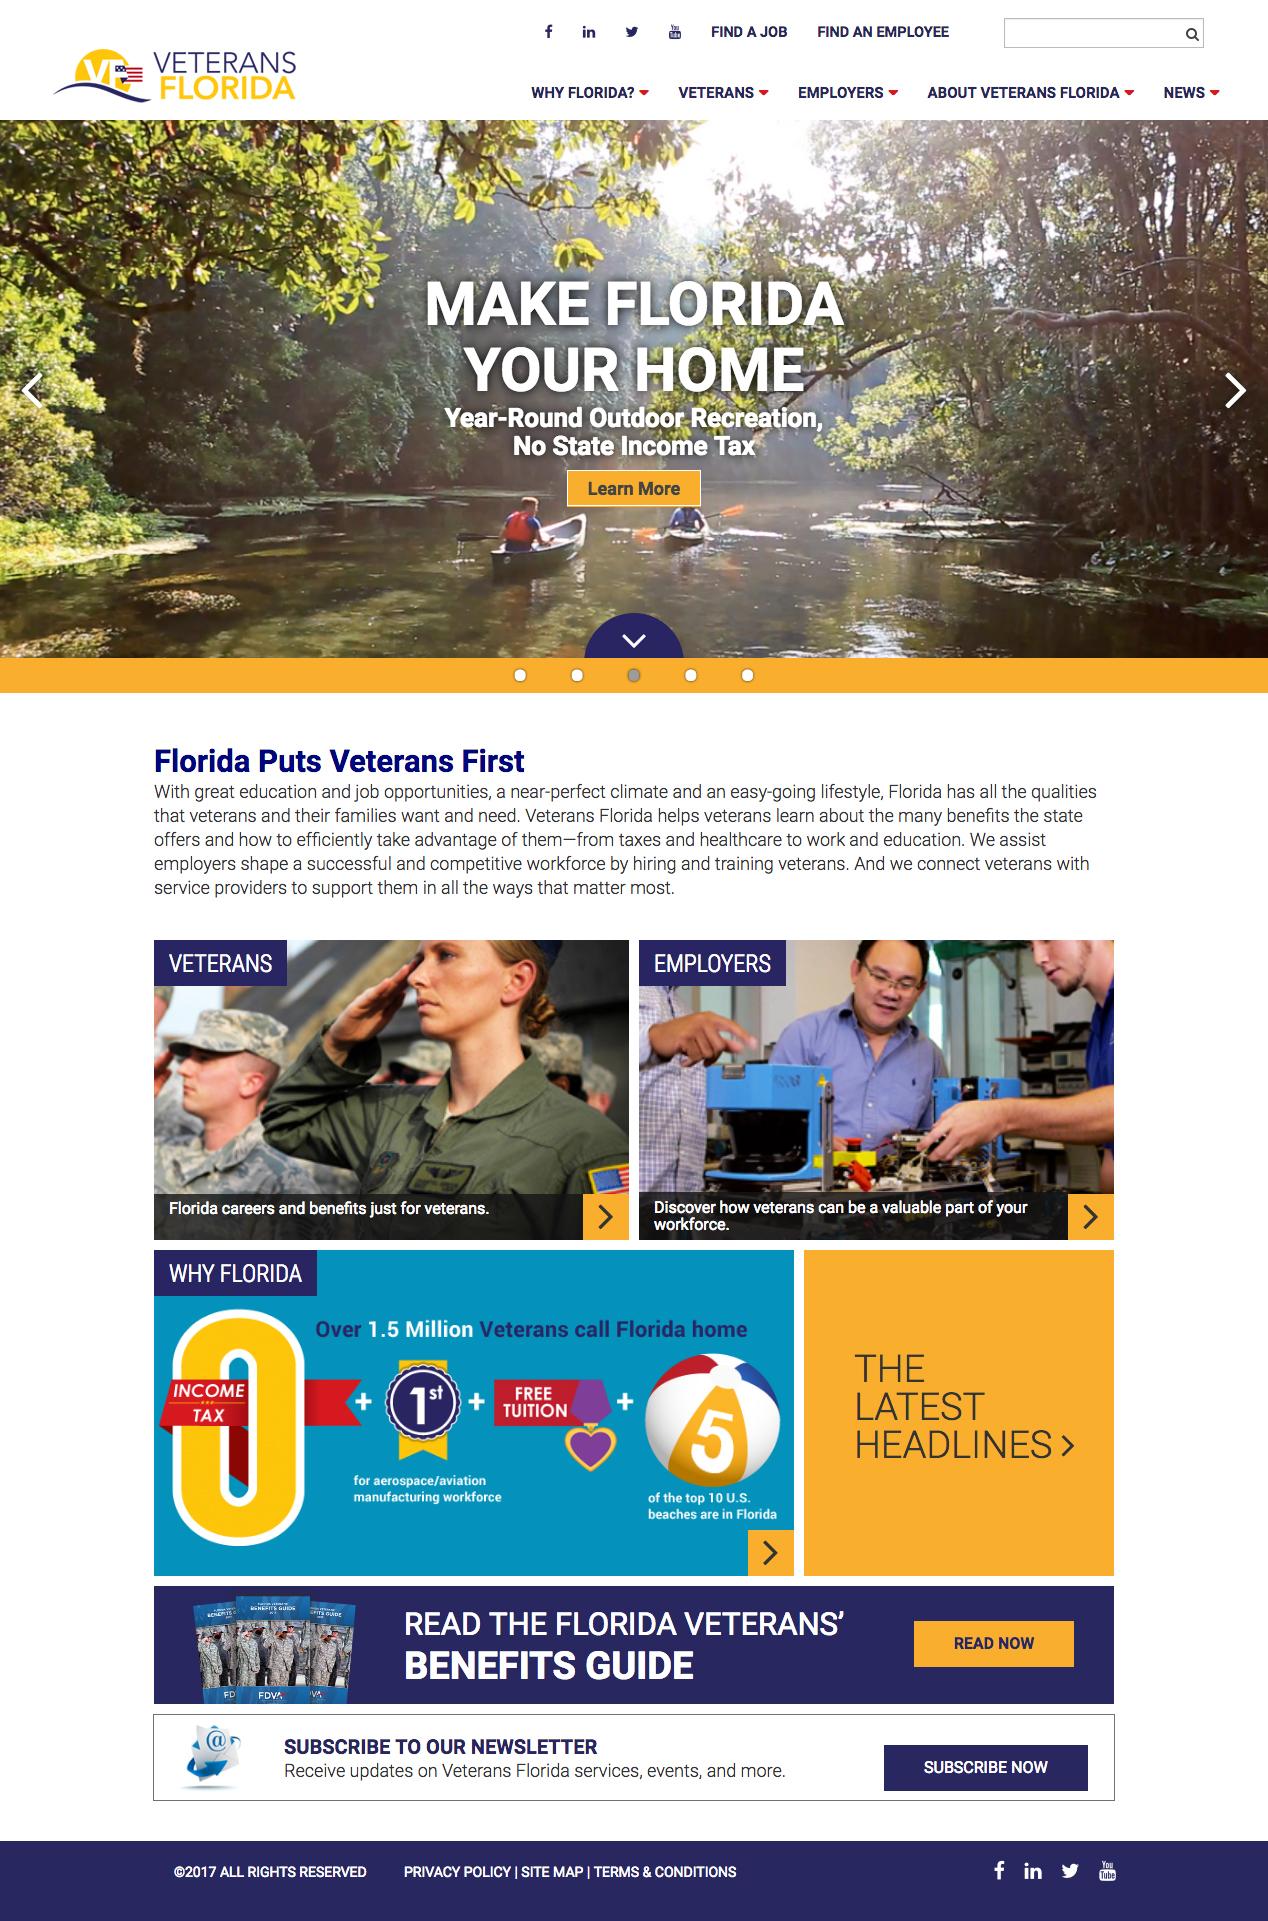 Veterans Florida, Florida Works for Veterans image